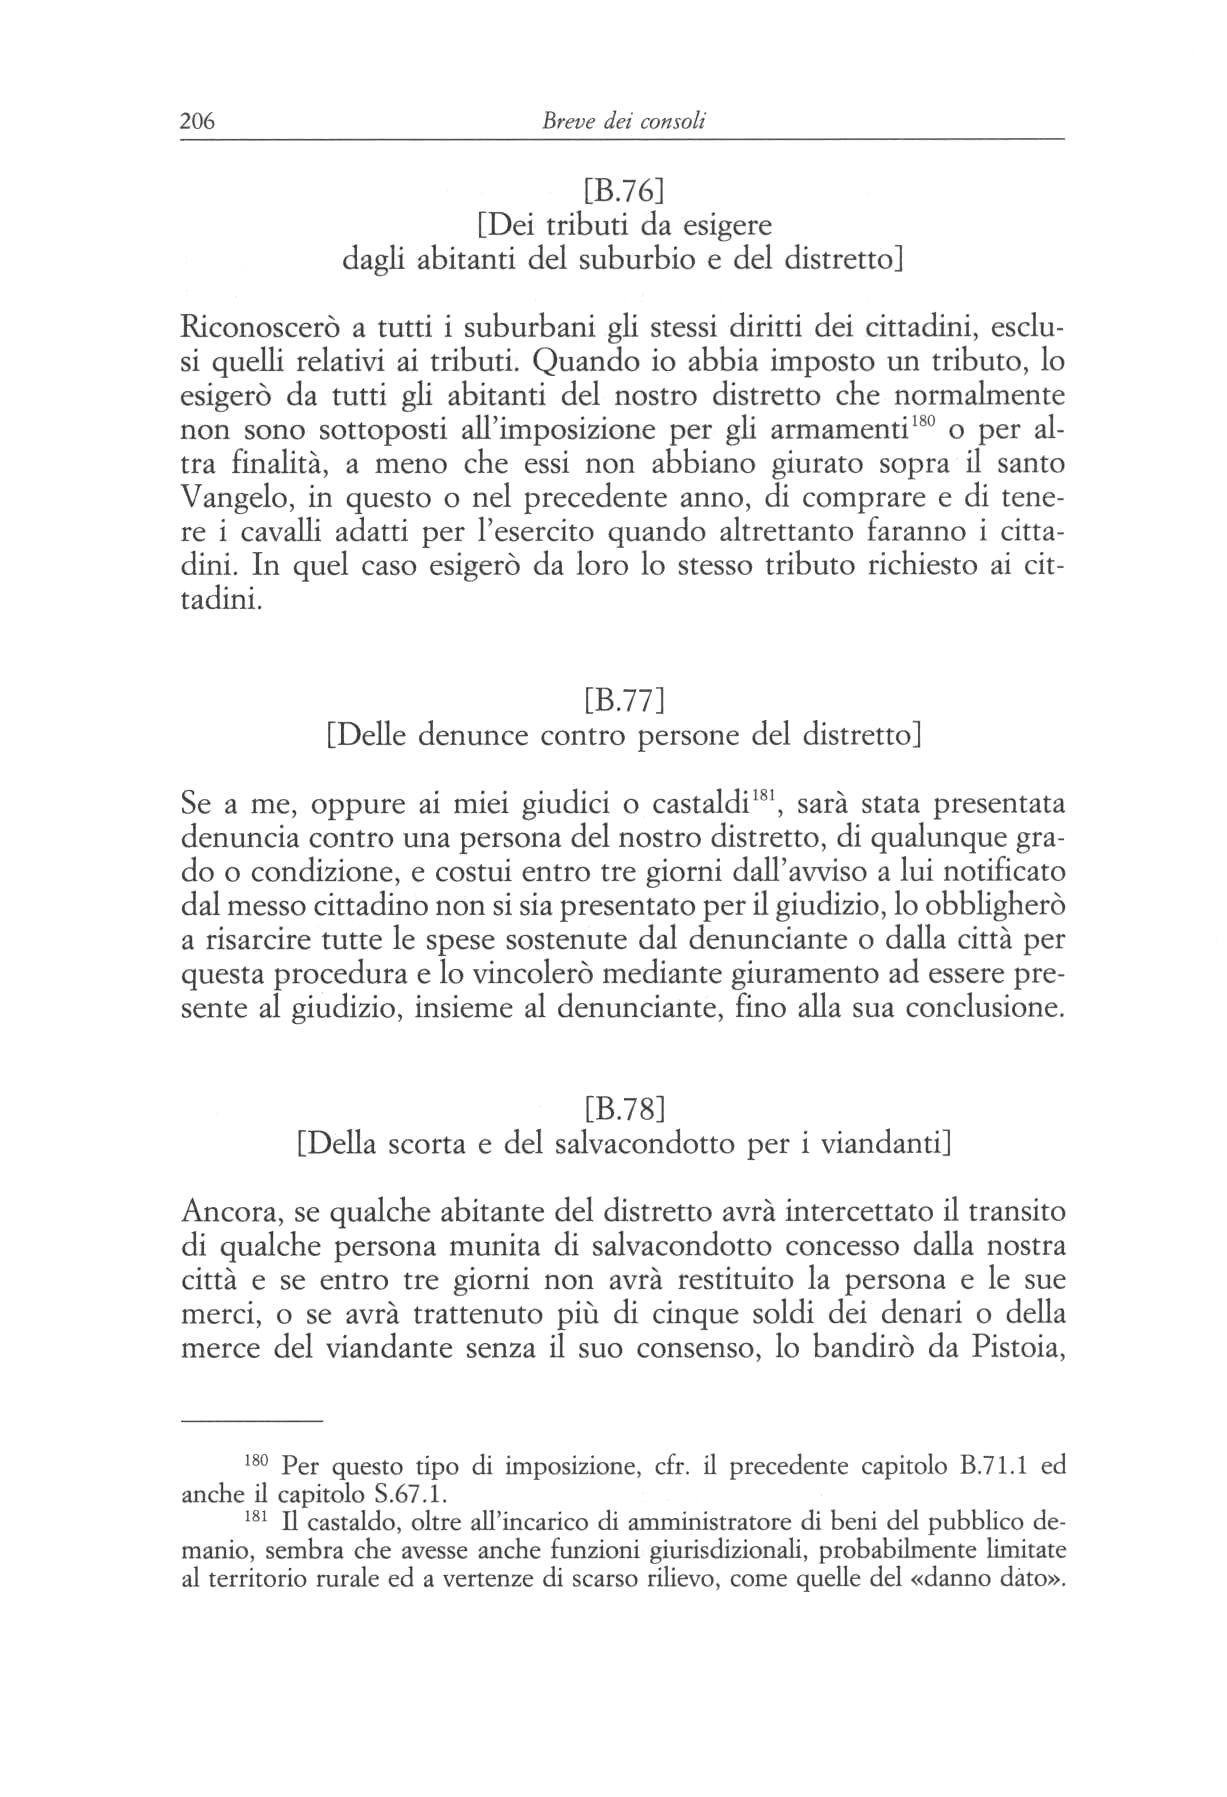 statuti pistoiesi del sec.XII 0206.jpg